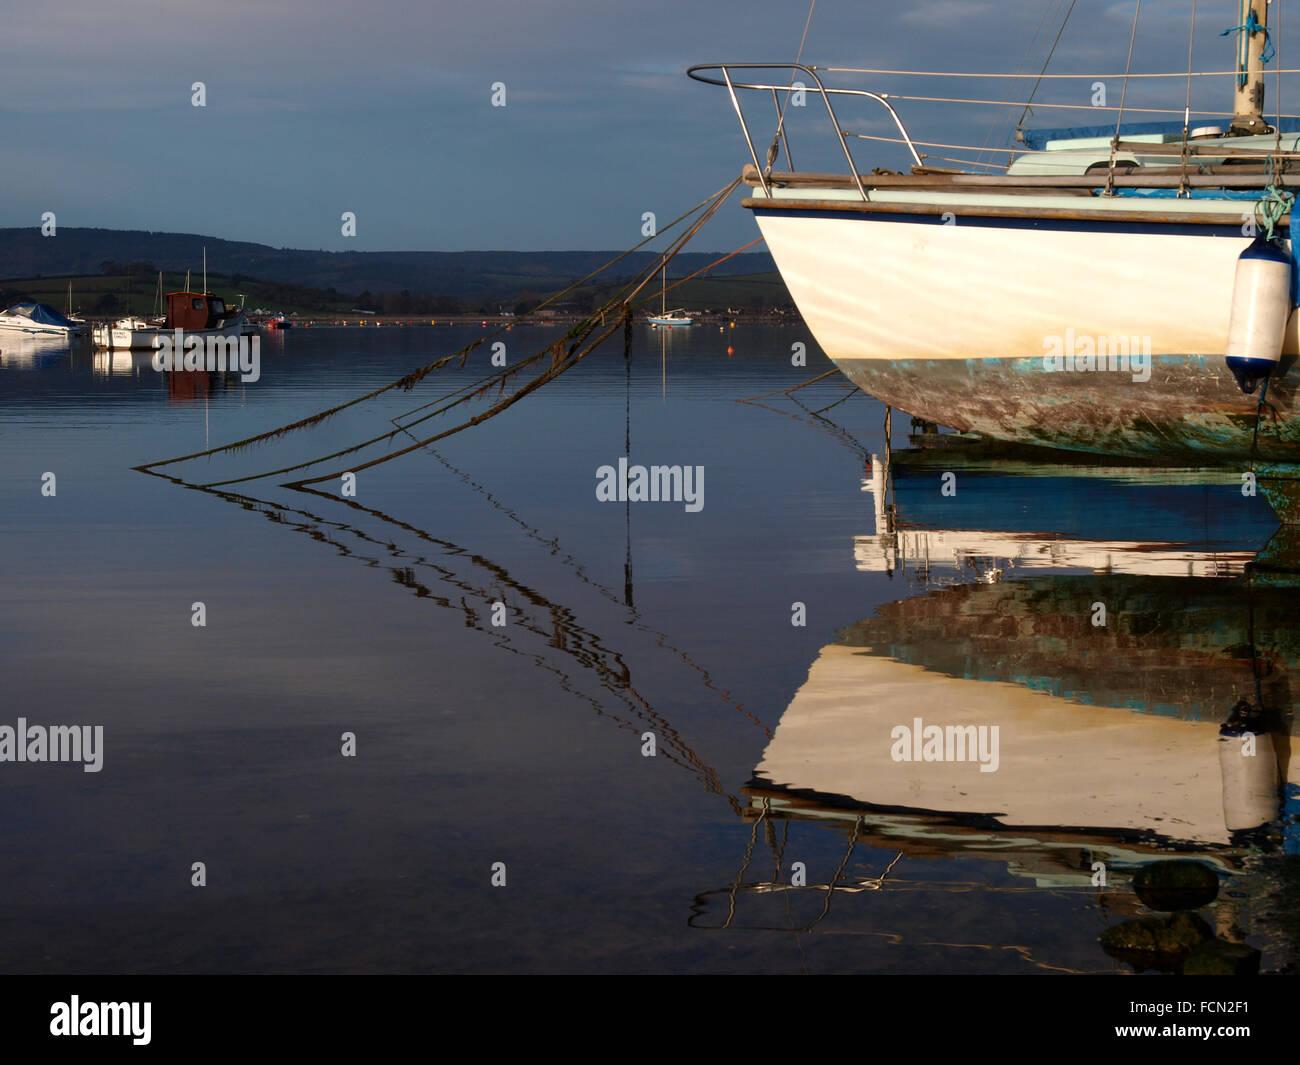 Yacht moored on the Exe Estuary, Exmouth, Devon, UK - Stock Image